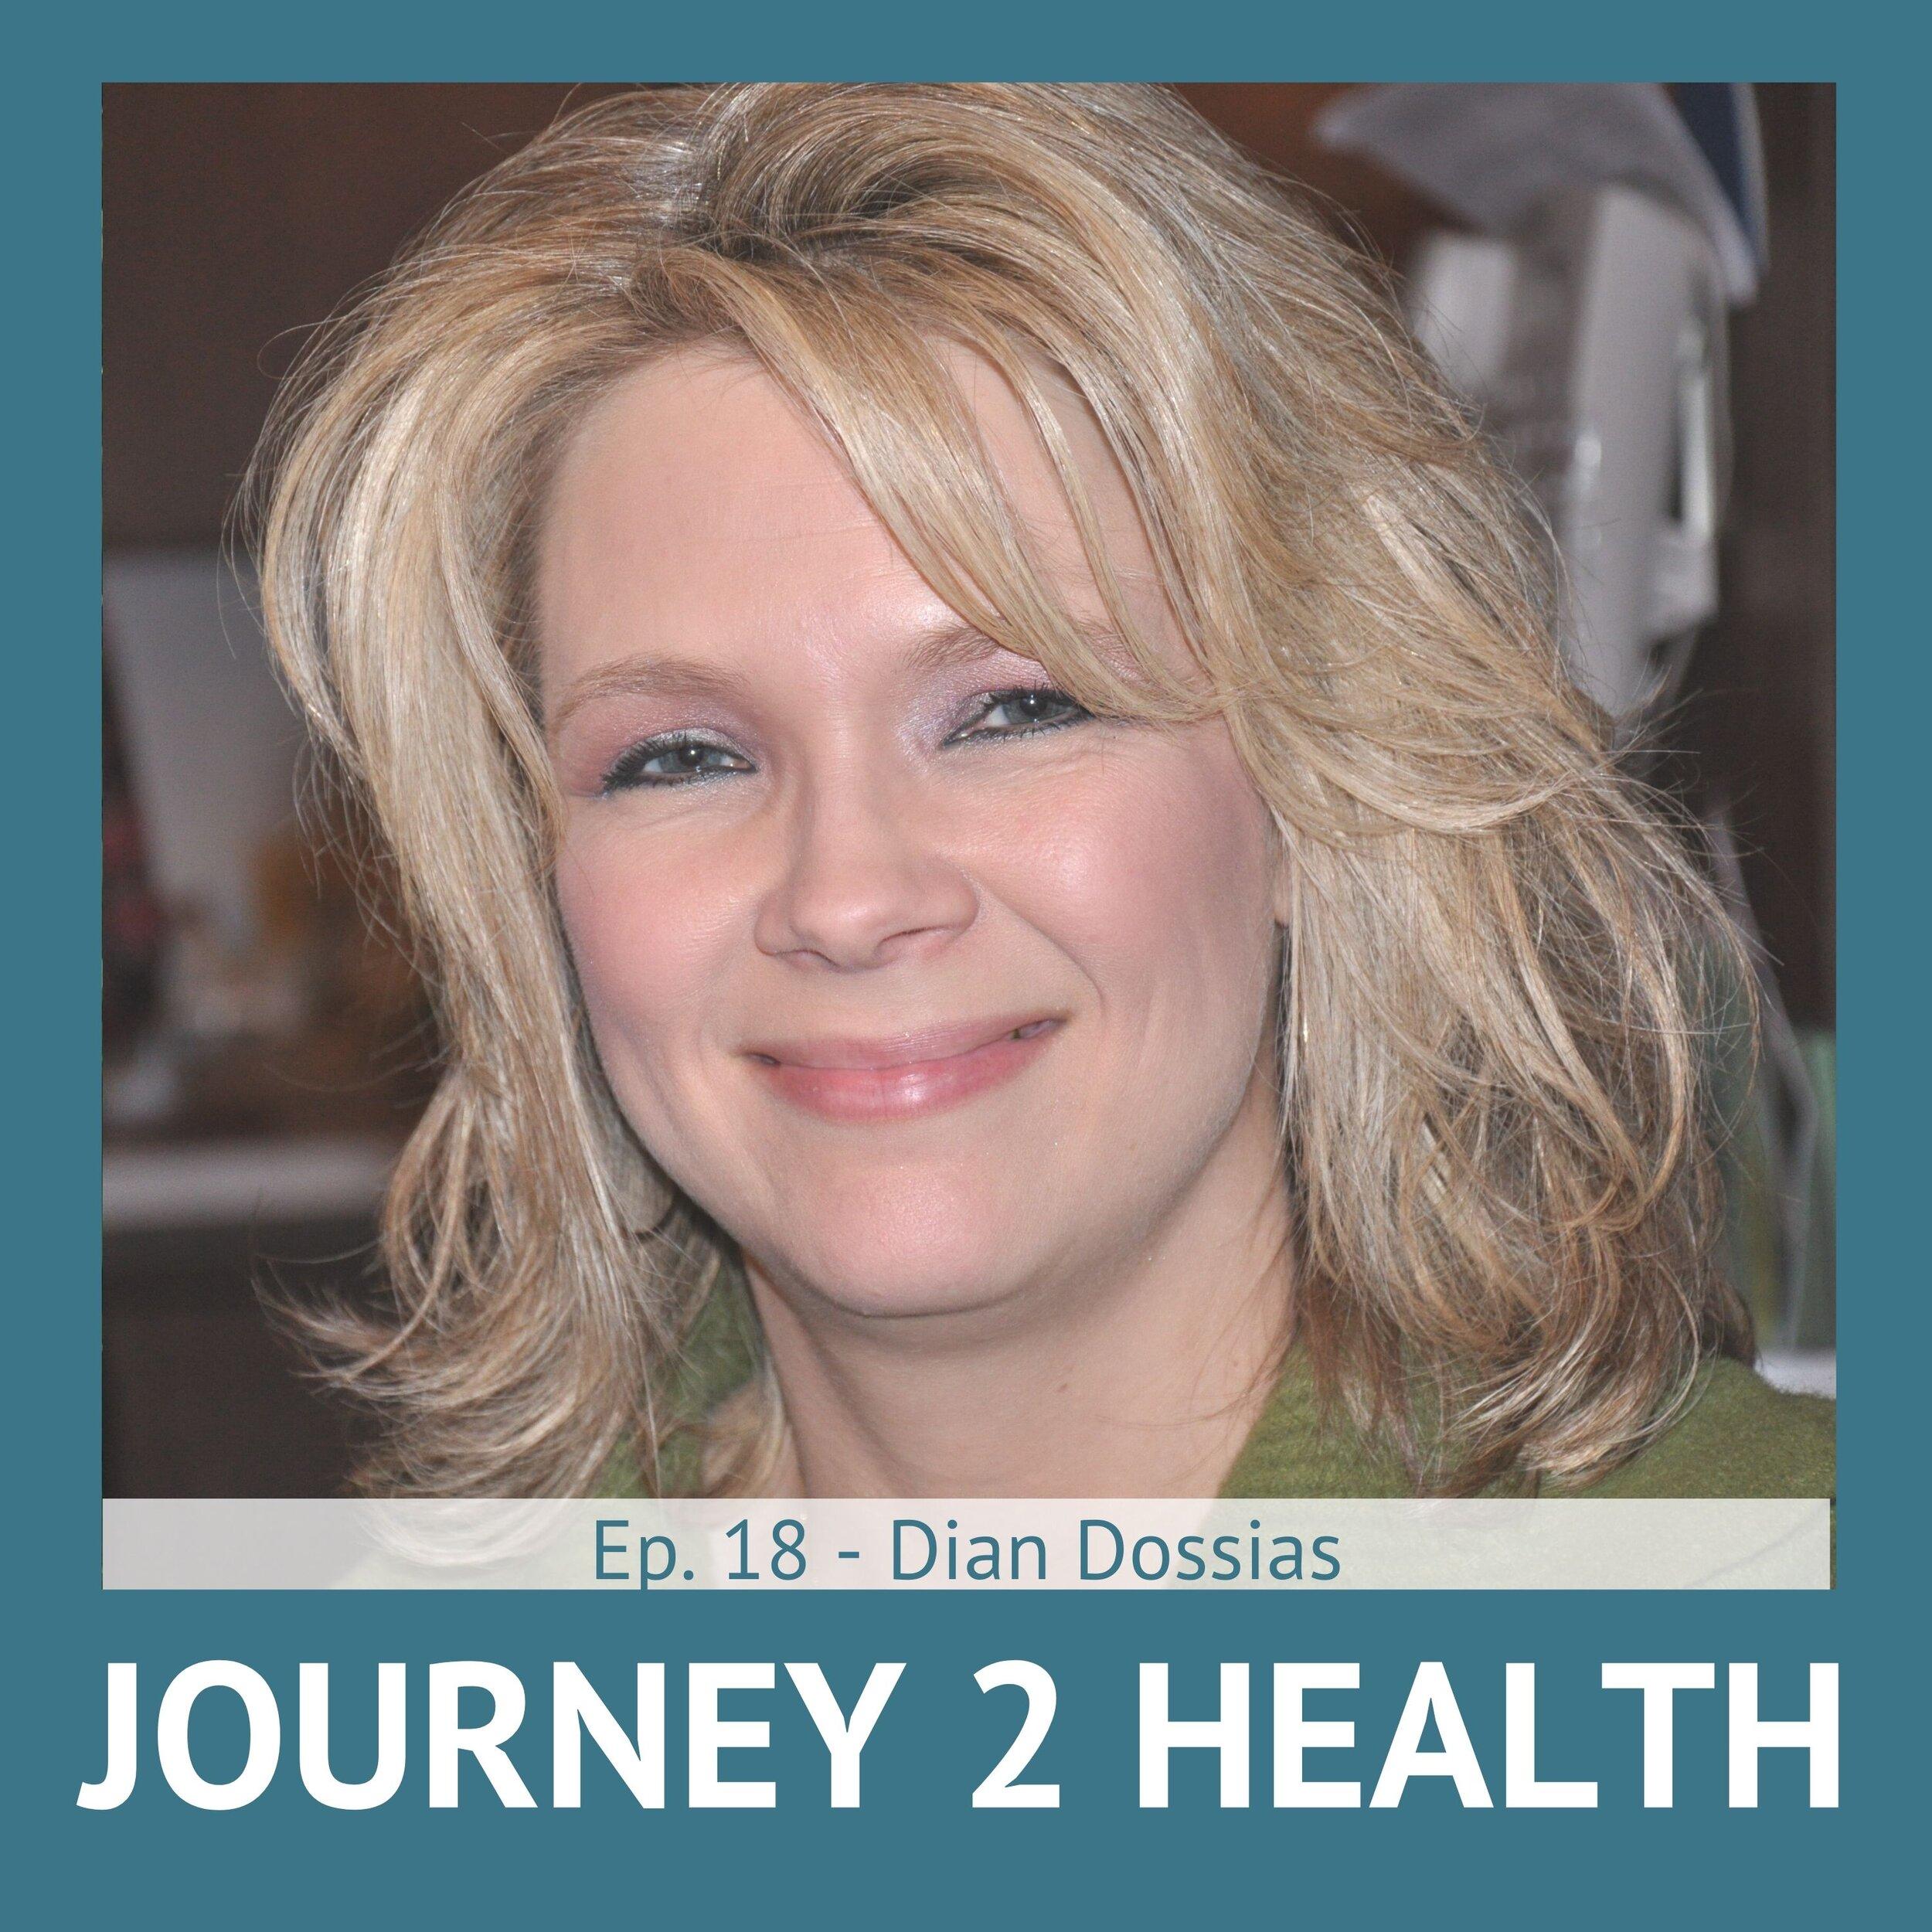 Ep #18 - Dian Dossias